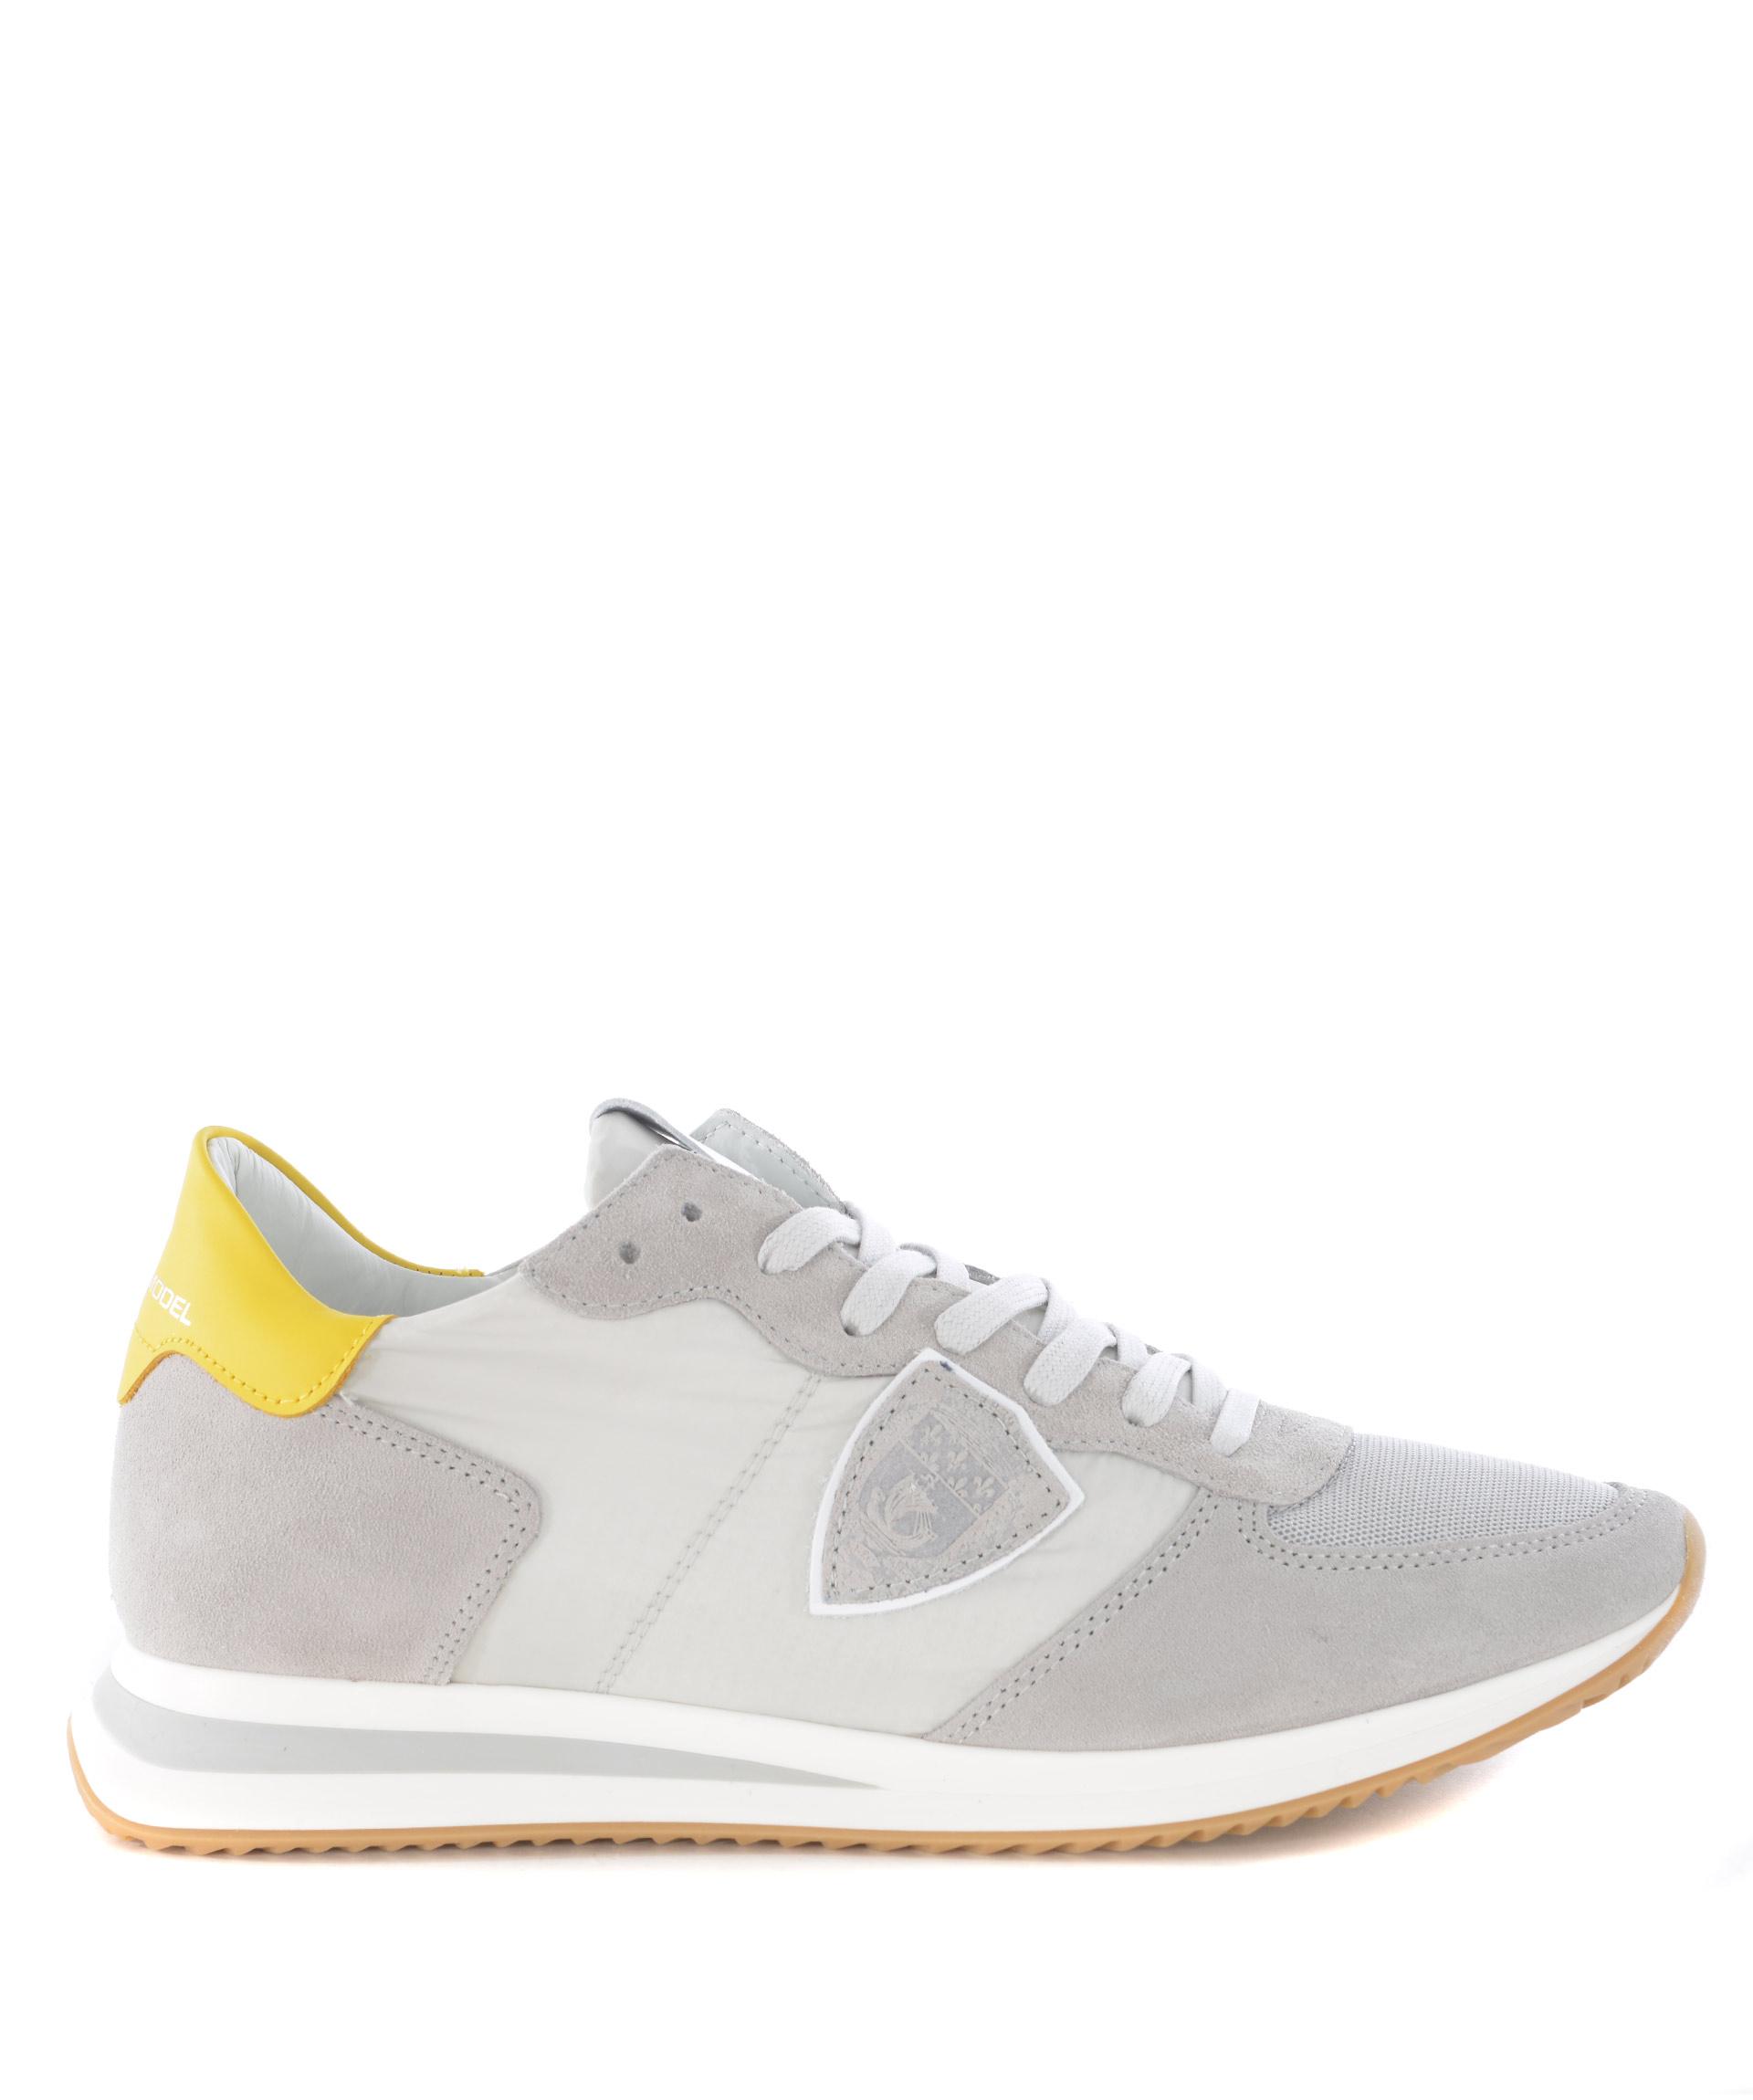 Sneakers uomo Philippe Model trpx low